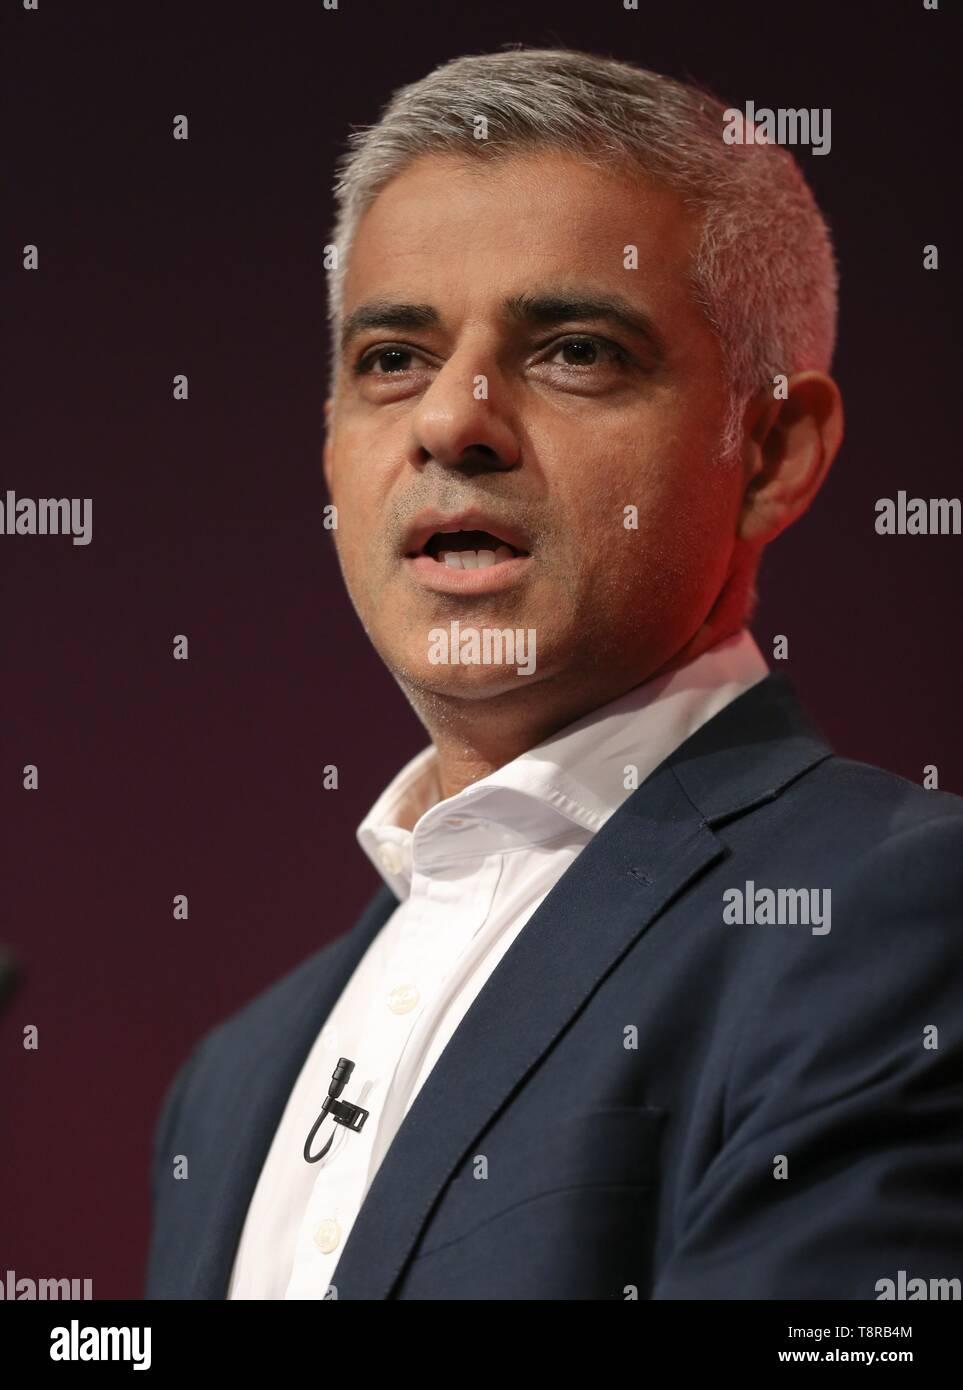 SADIQ KHAN, 2017 - Stock Image